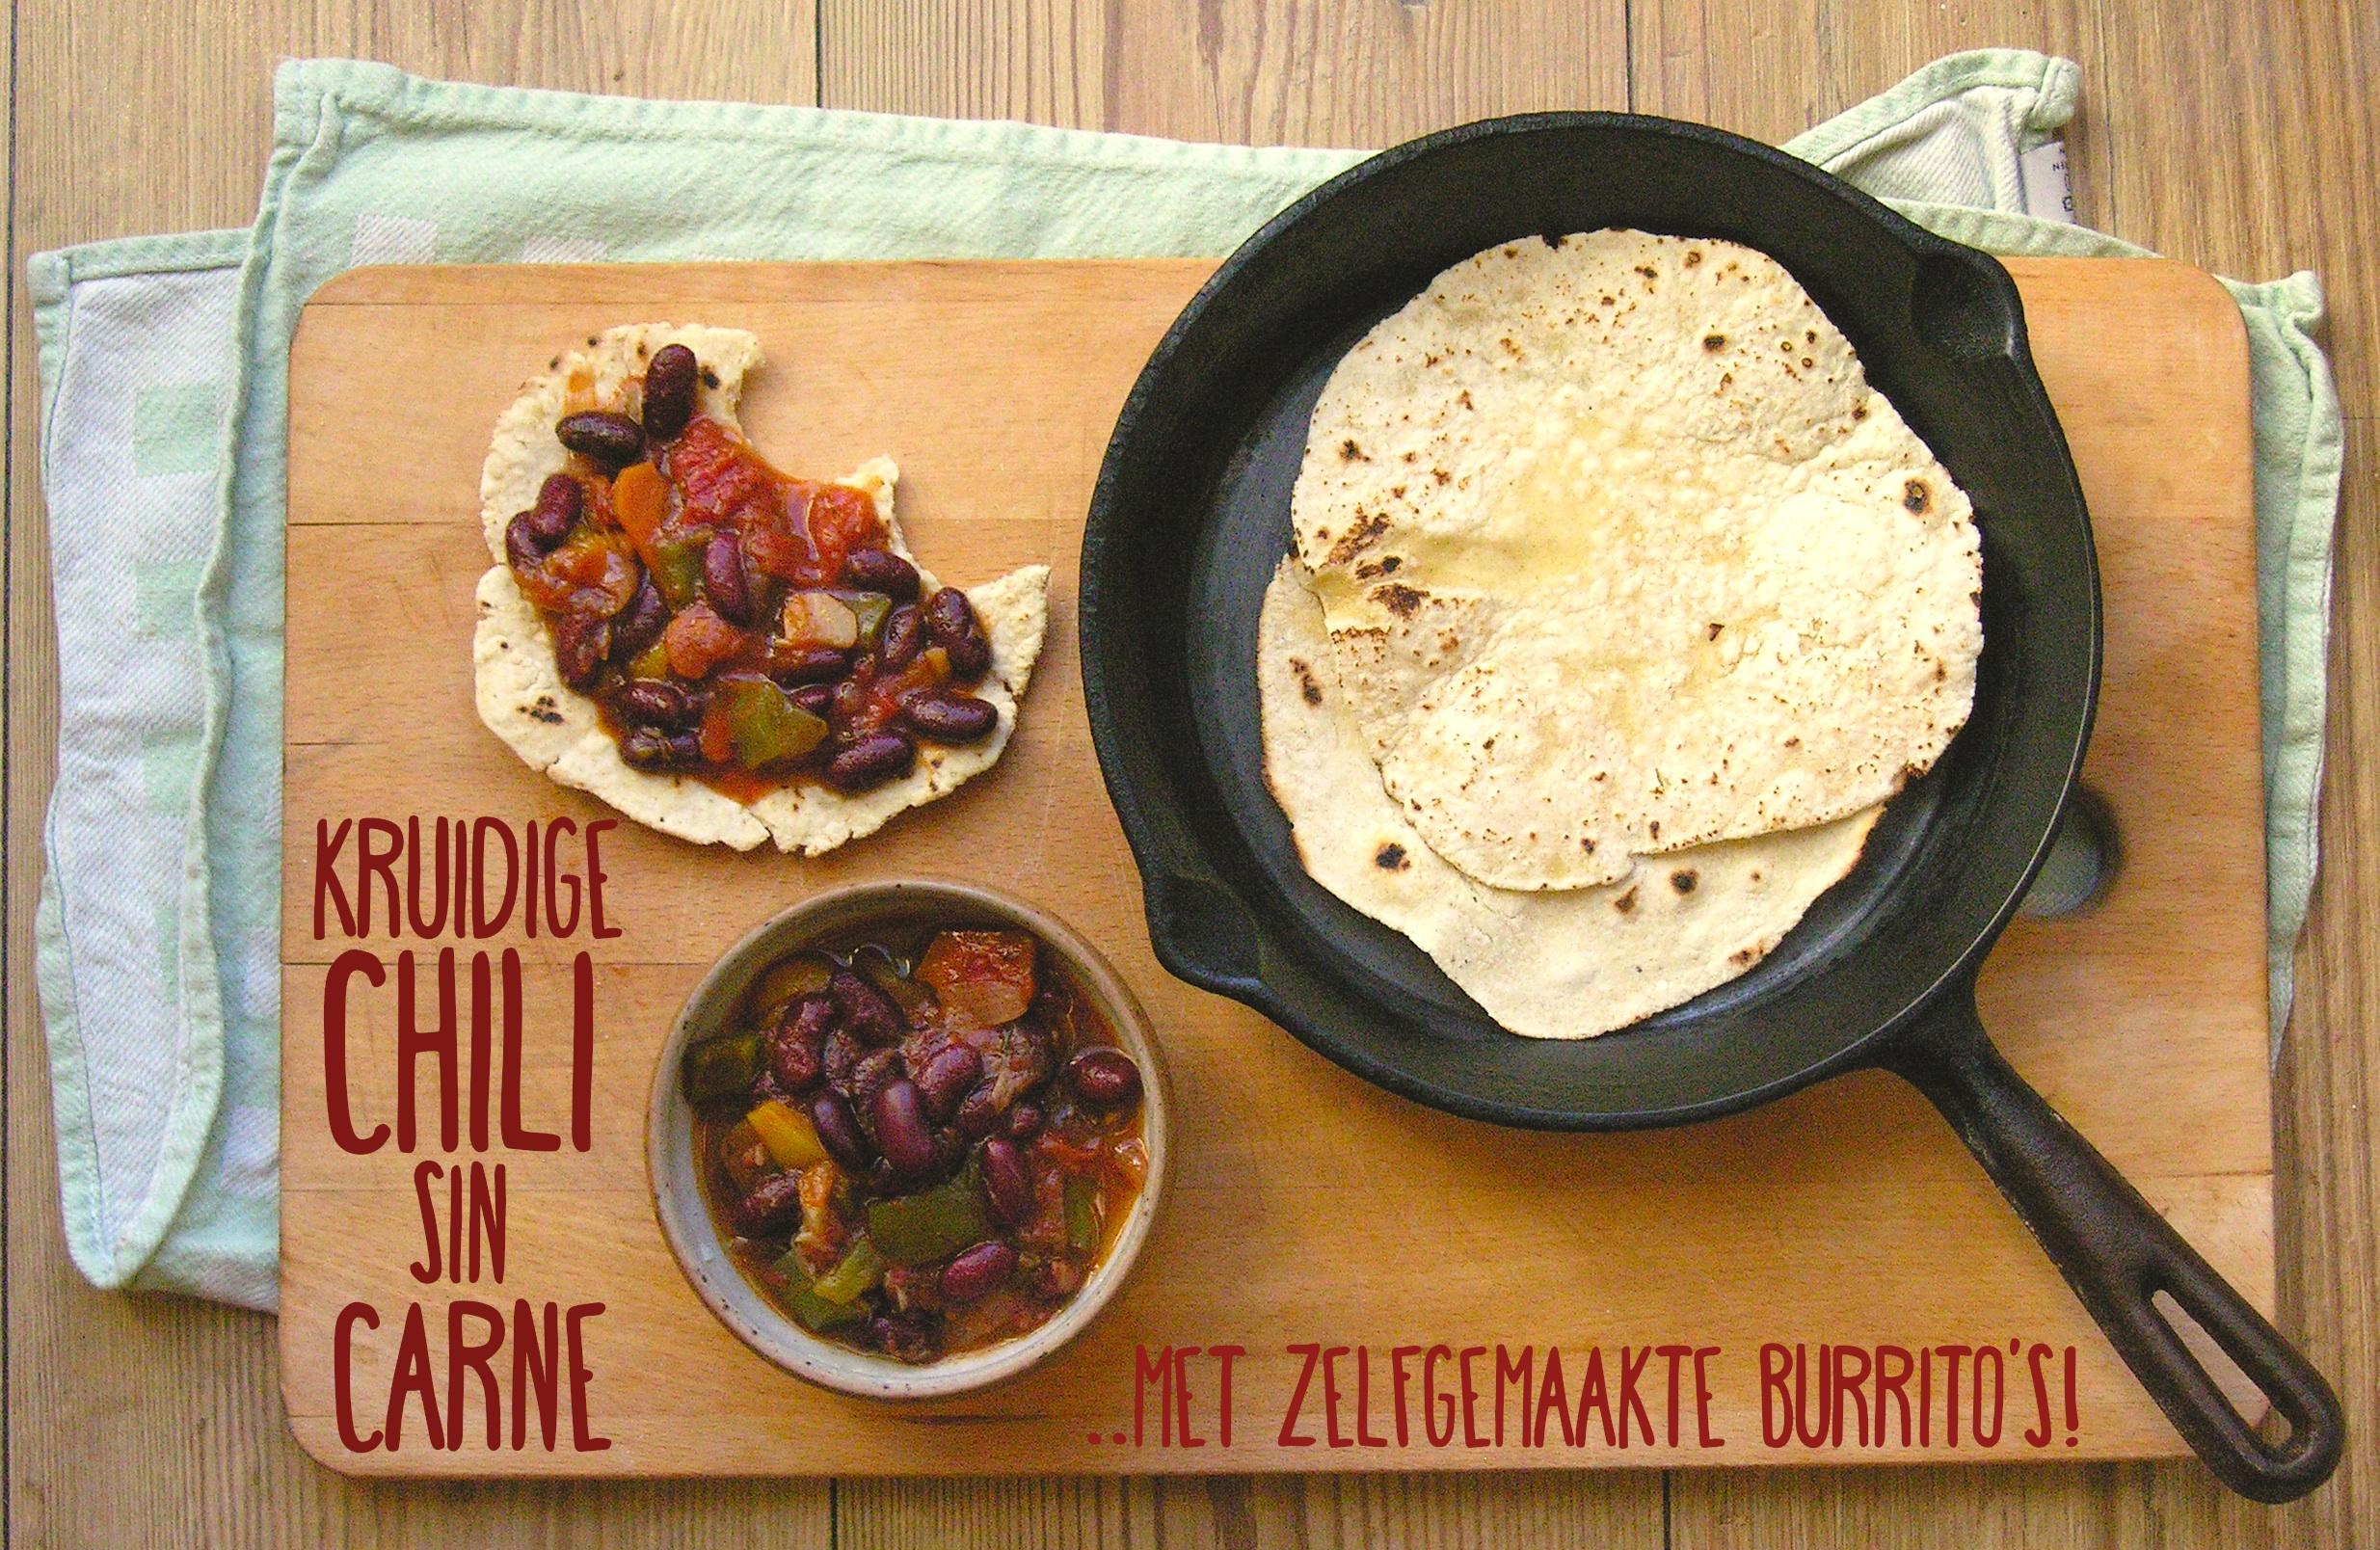 Chili sin carne met zelfgemaakte glutenvrije burrito's